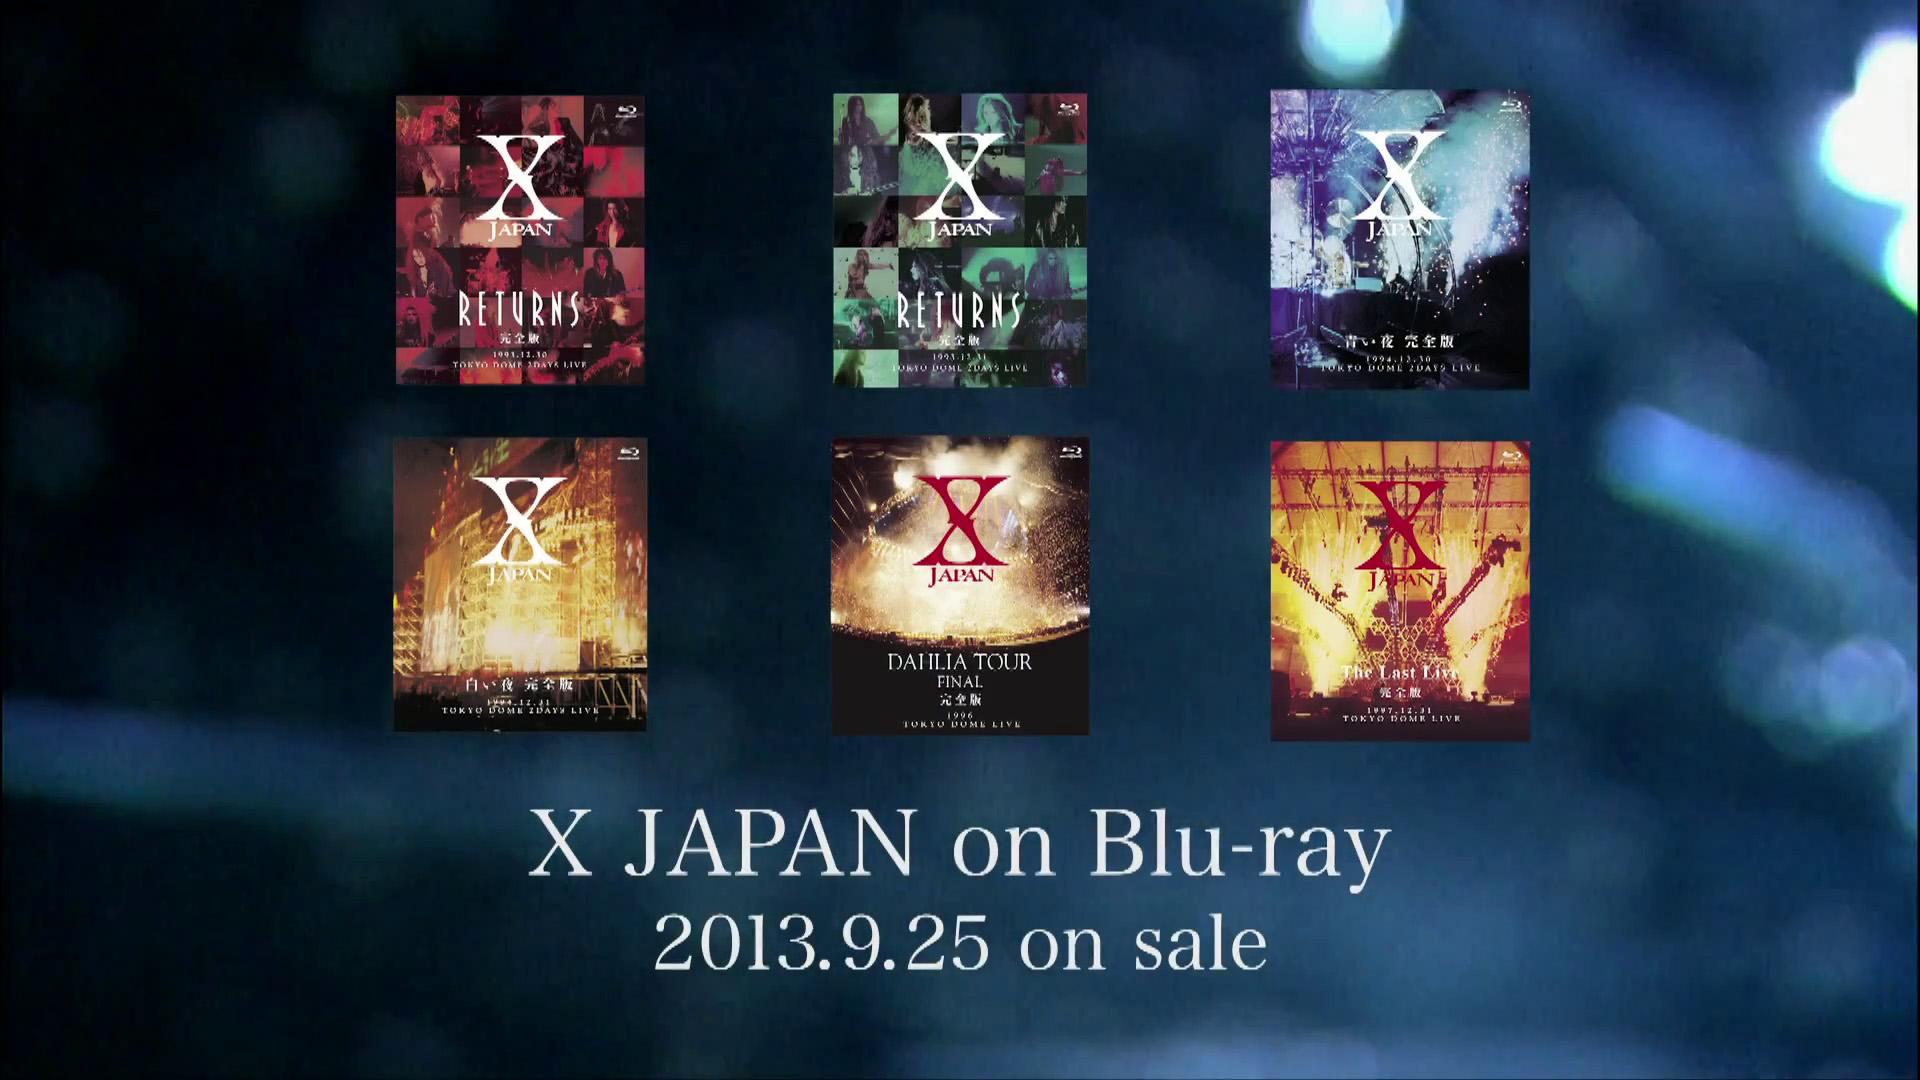 JRock247-X-Japan-Blu-Ray-2013-A-promo